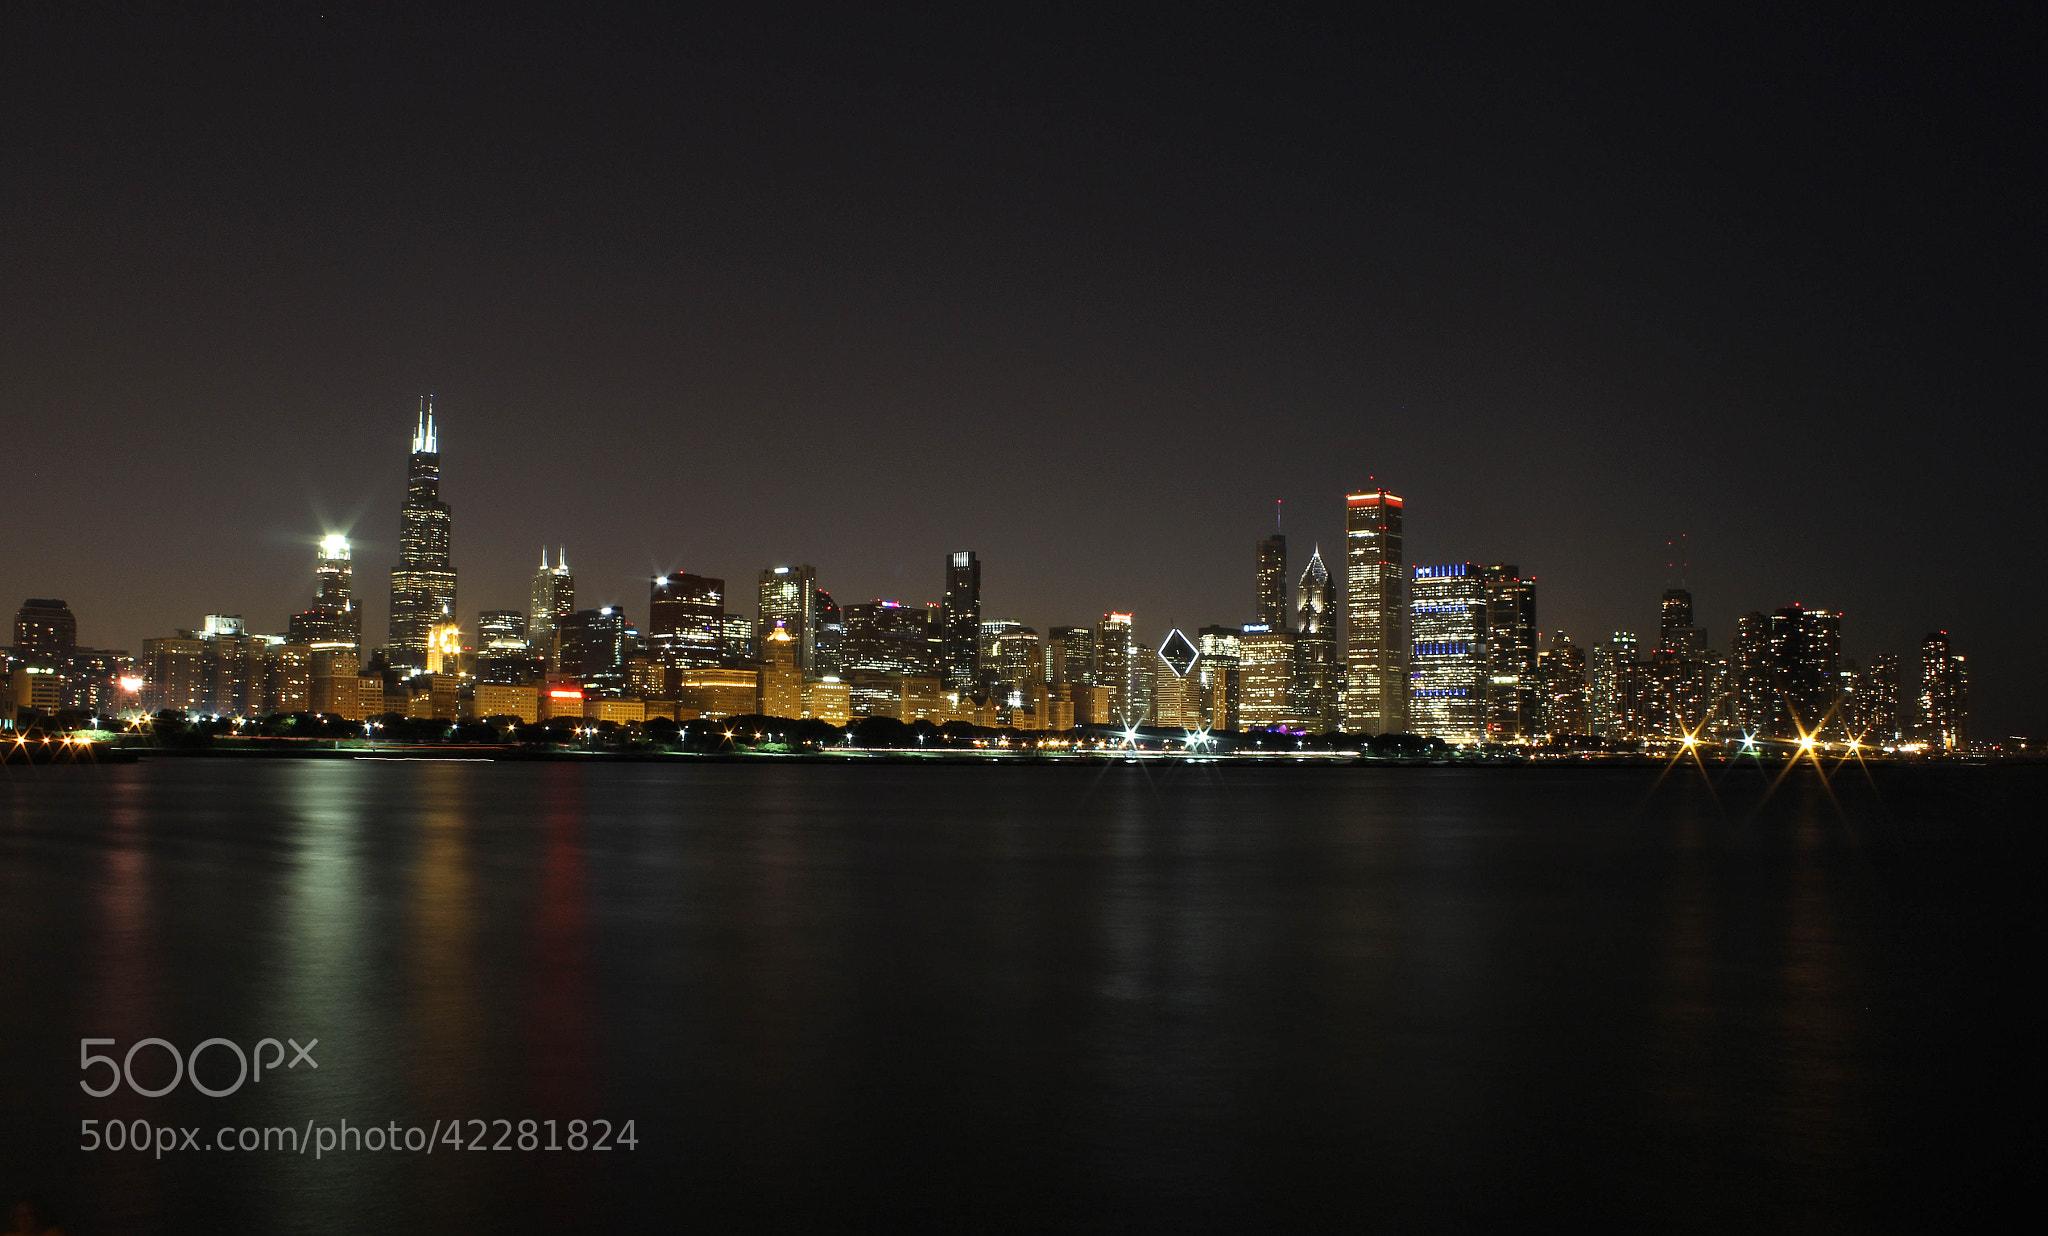 Photograph Skyline 1 by kimberlygreyson on 500px